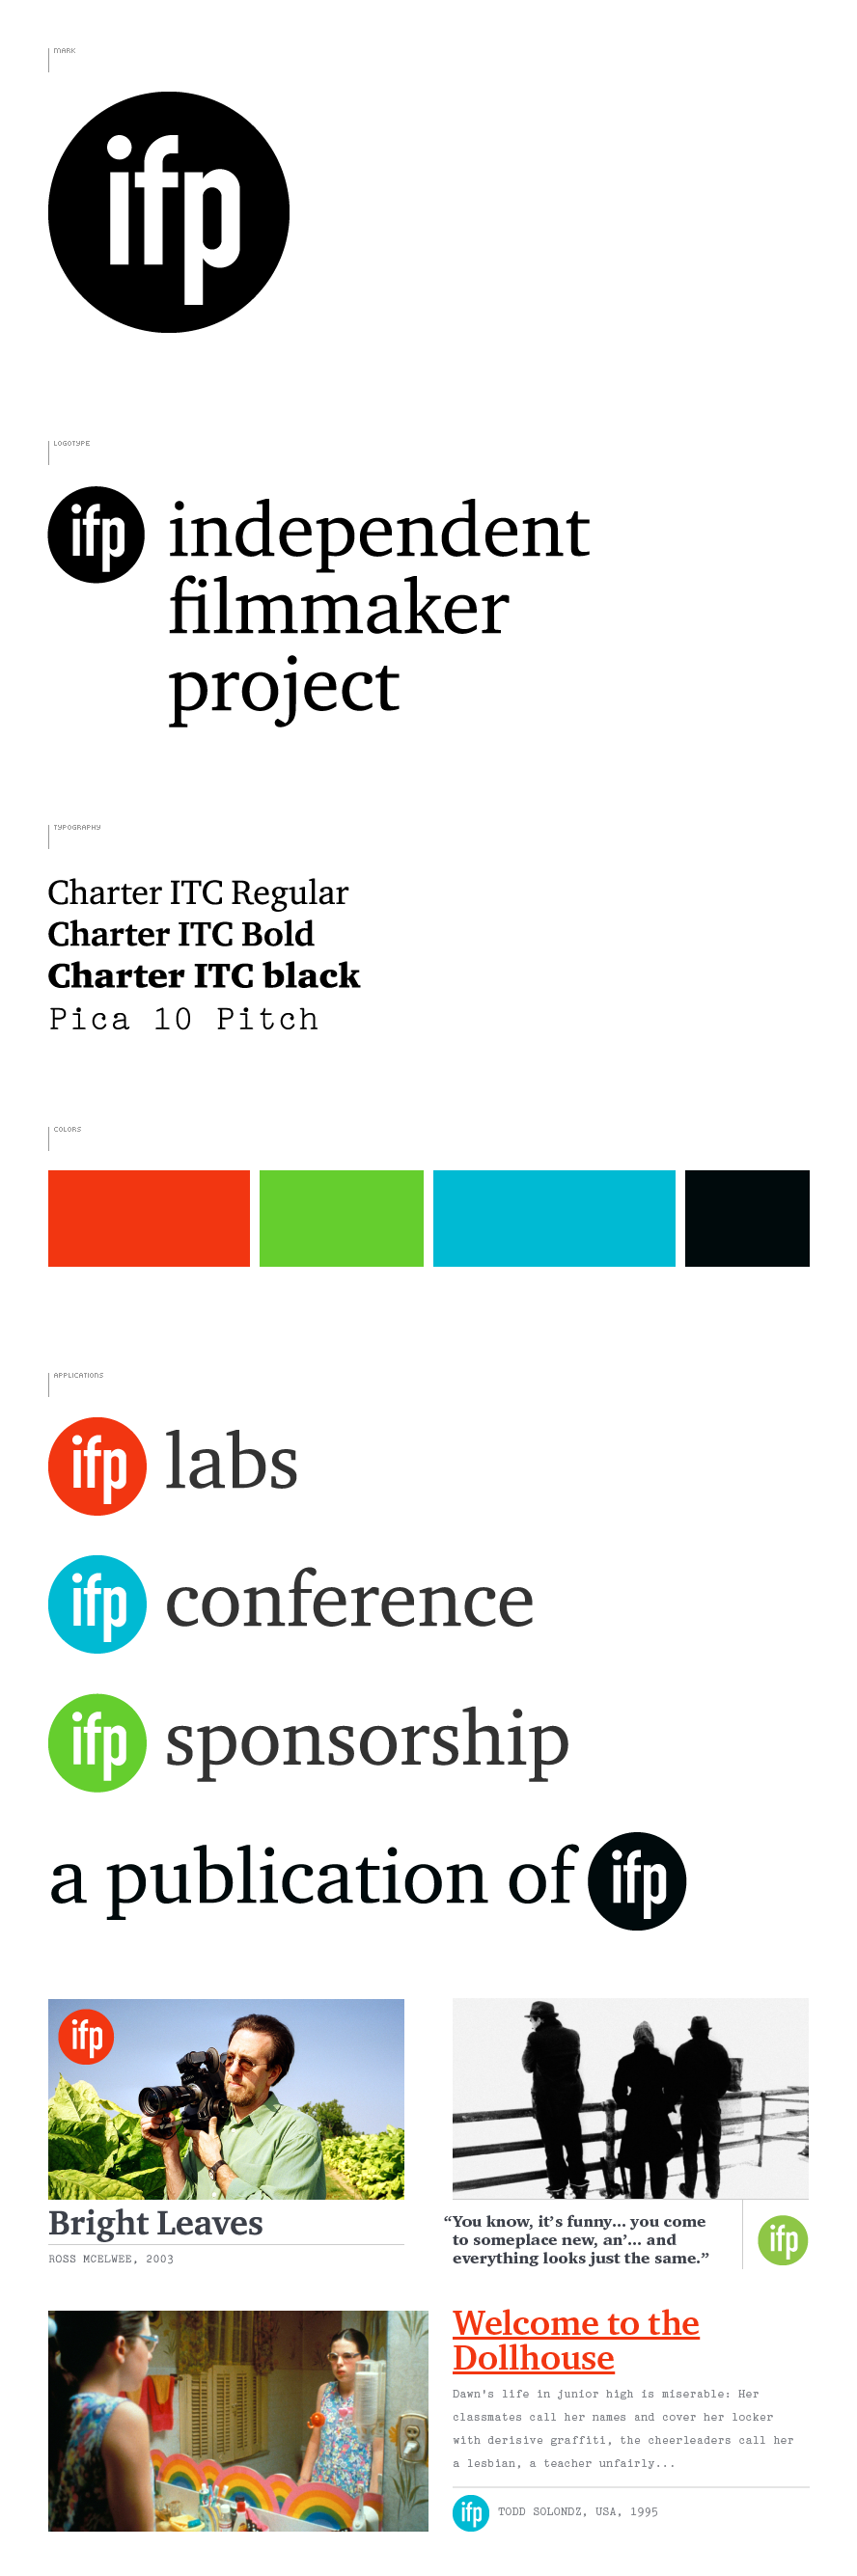 IFP Brand System